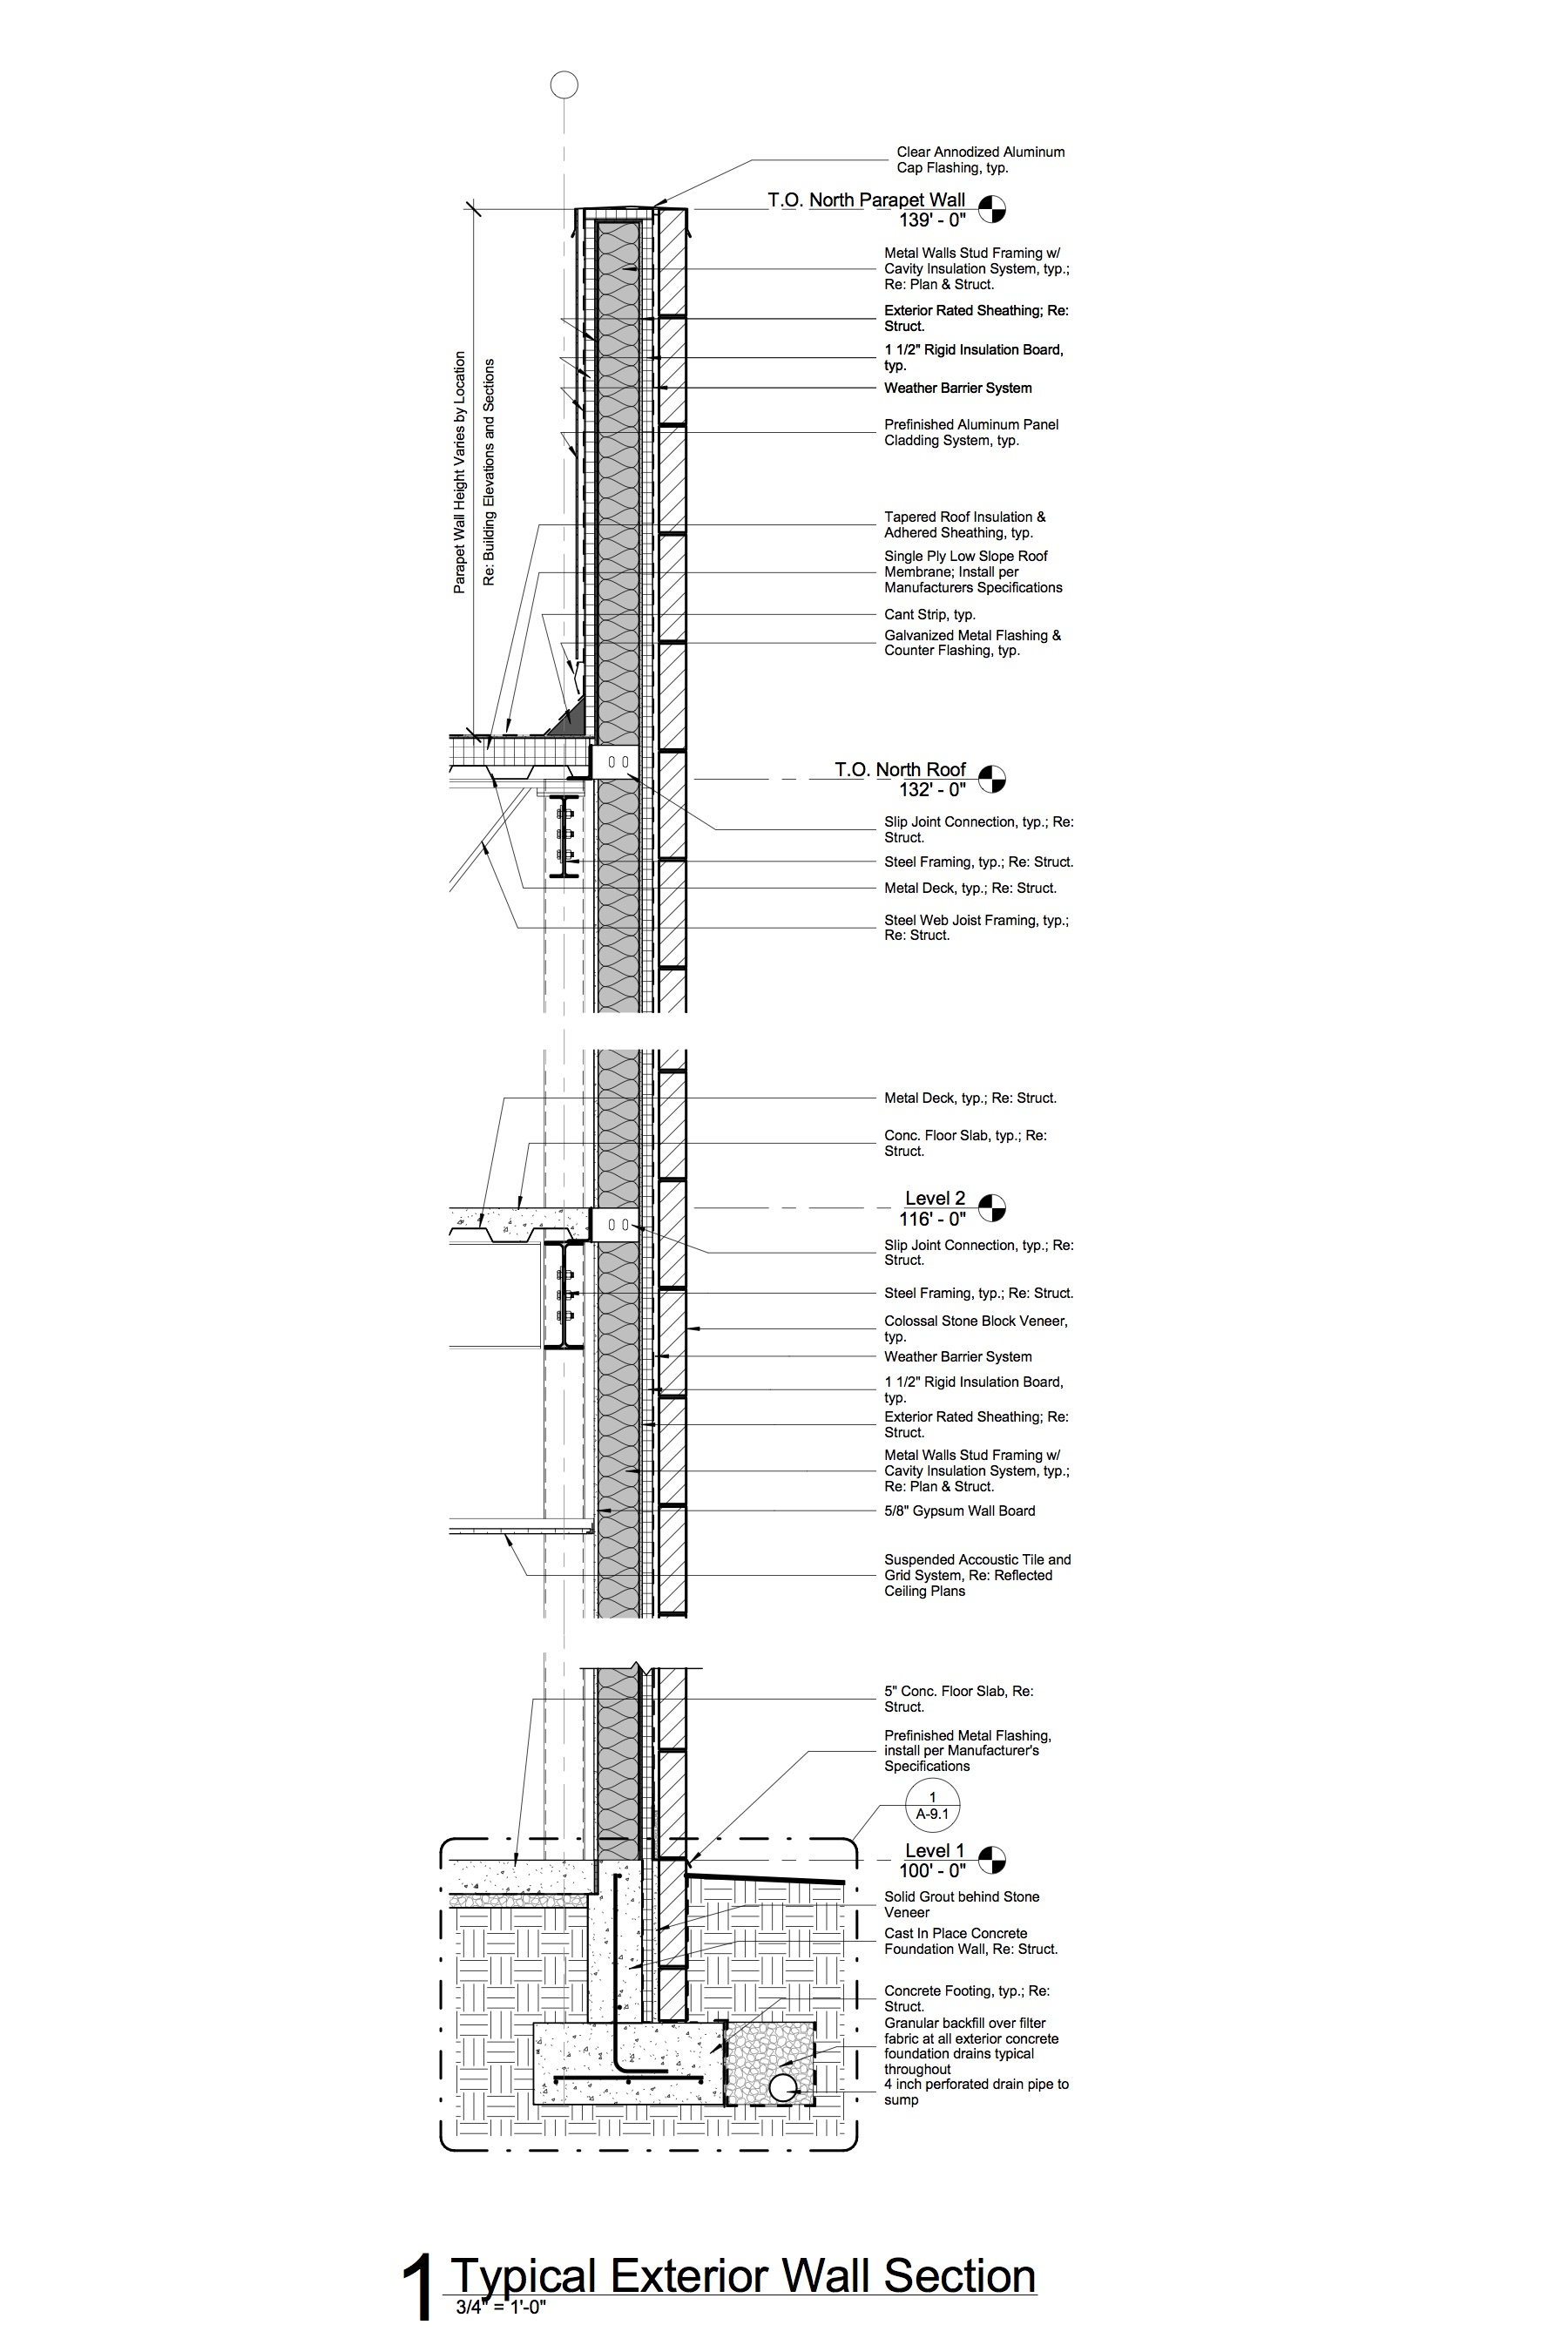 SMFD Wall Section_SMFR Preparedness Building